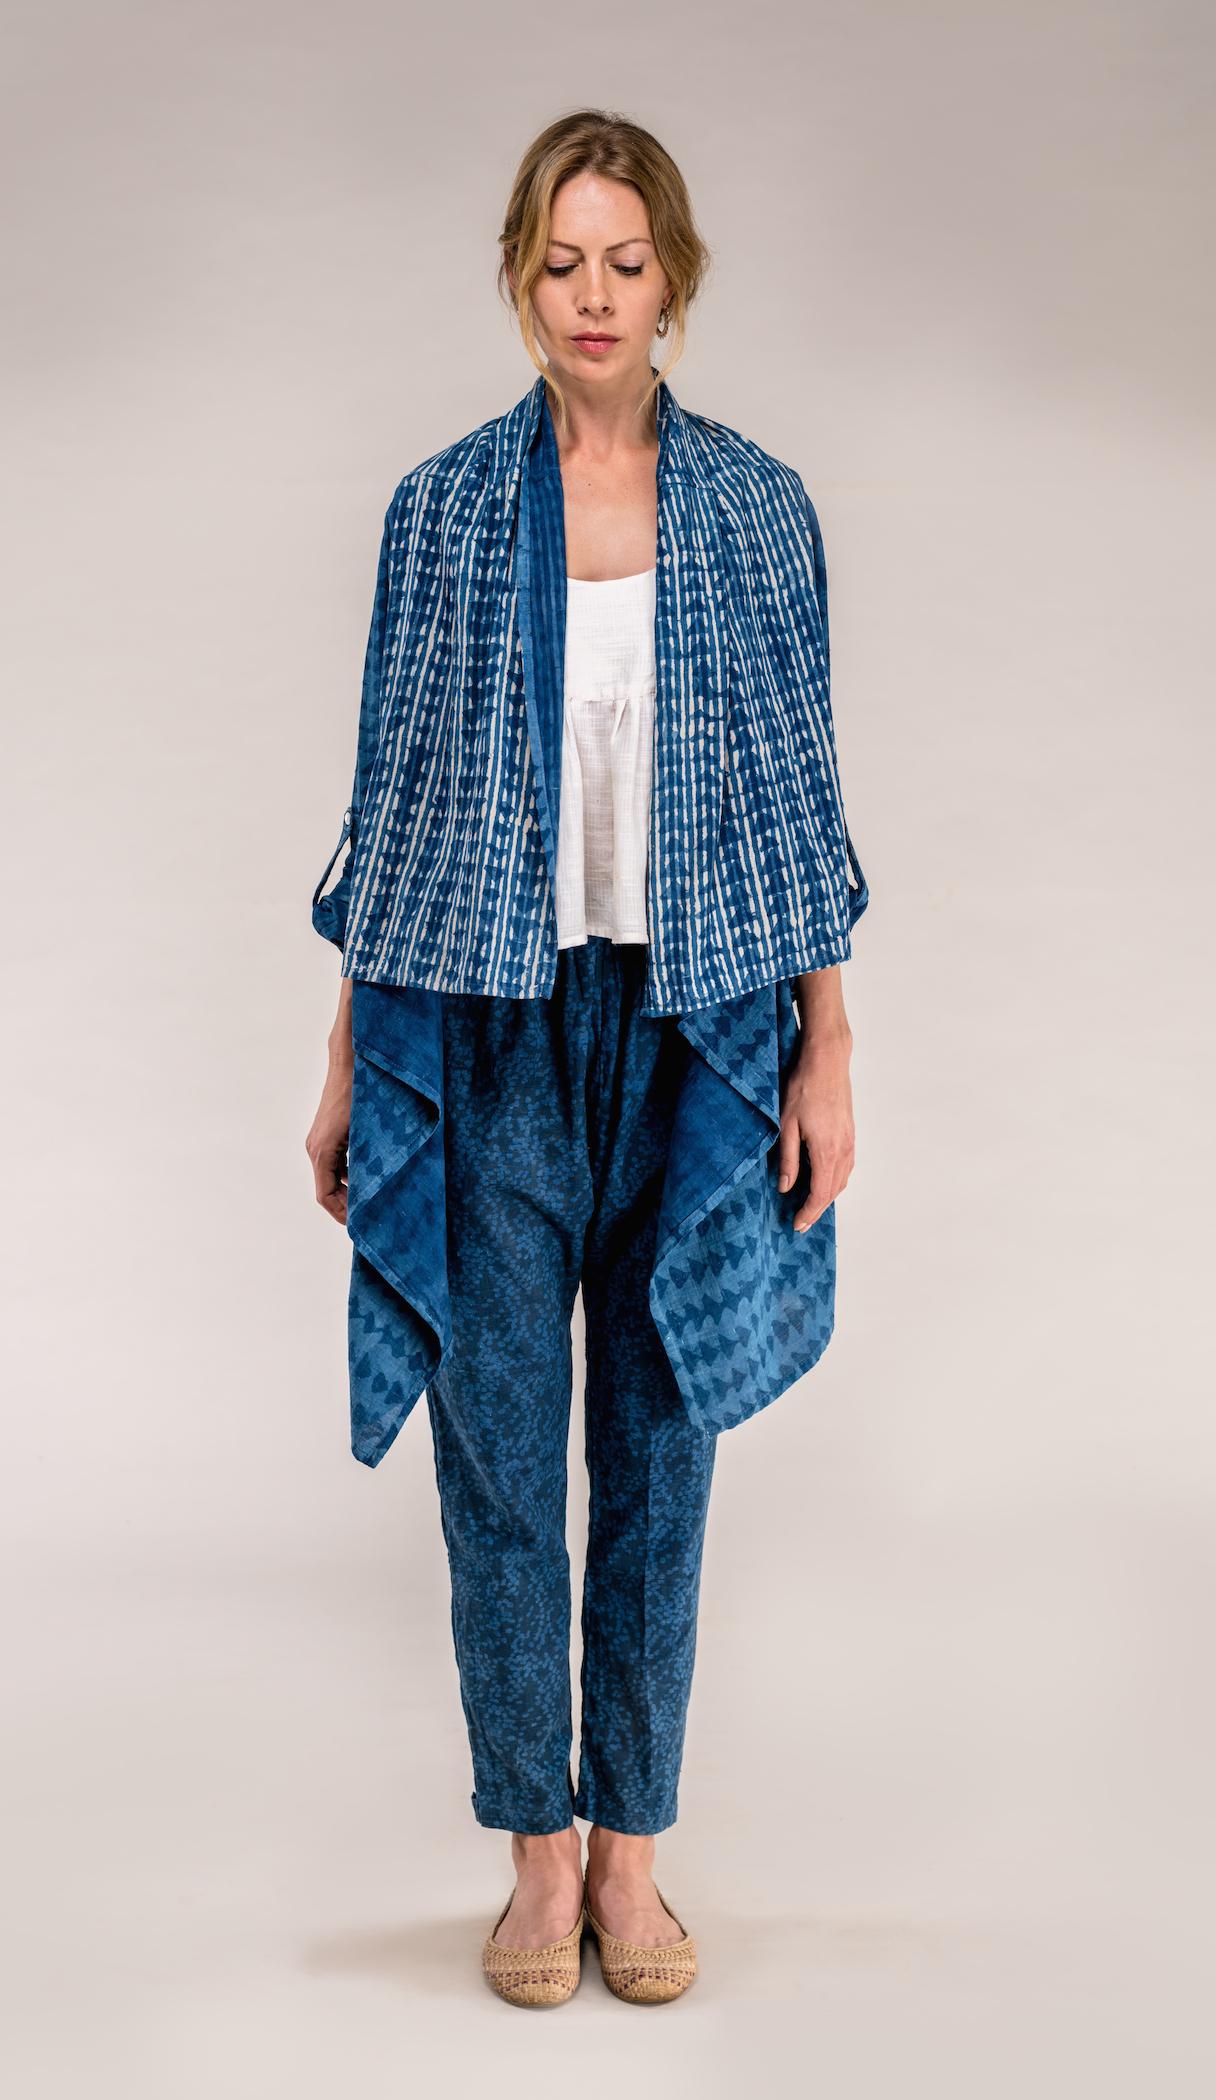 drape coat+choli tank + bowie pant